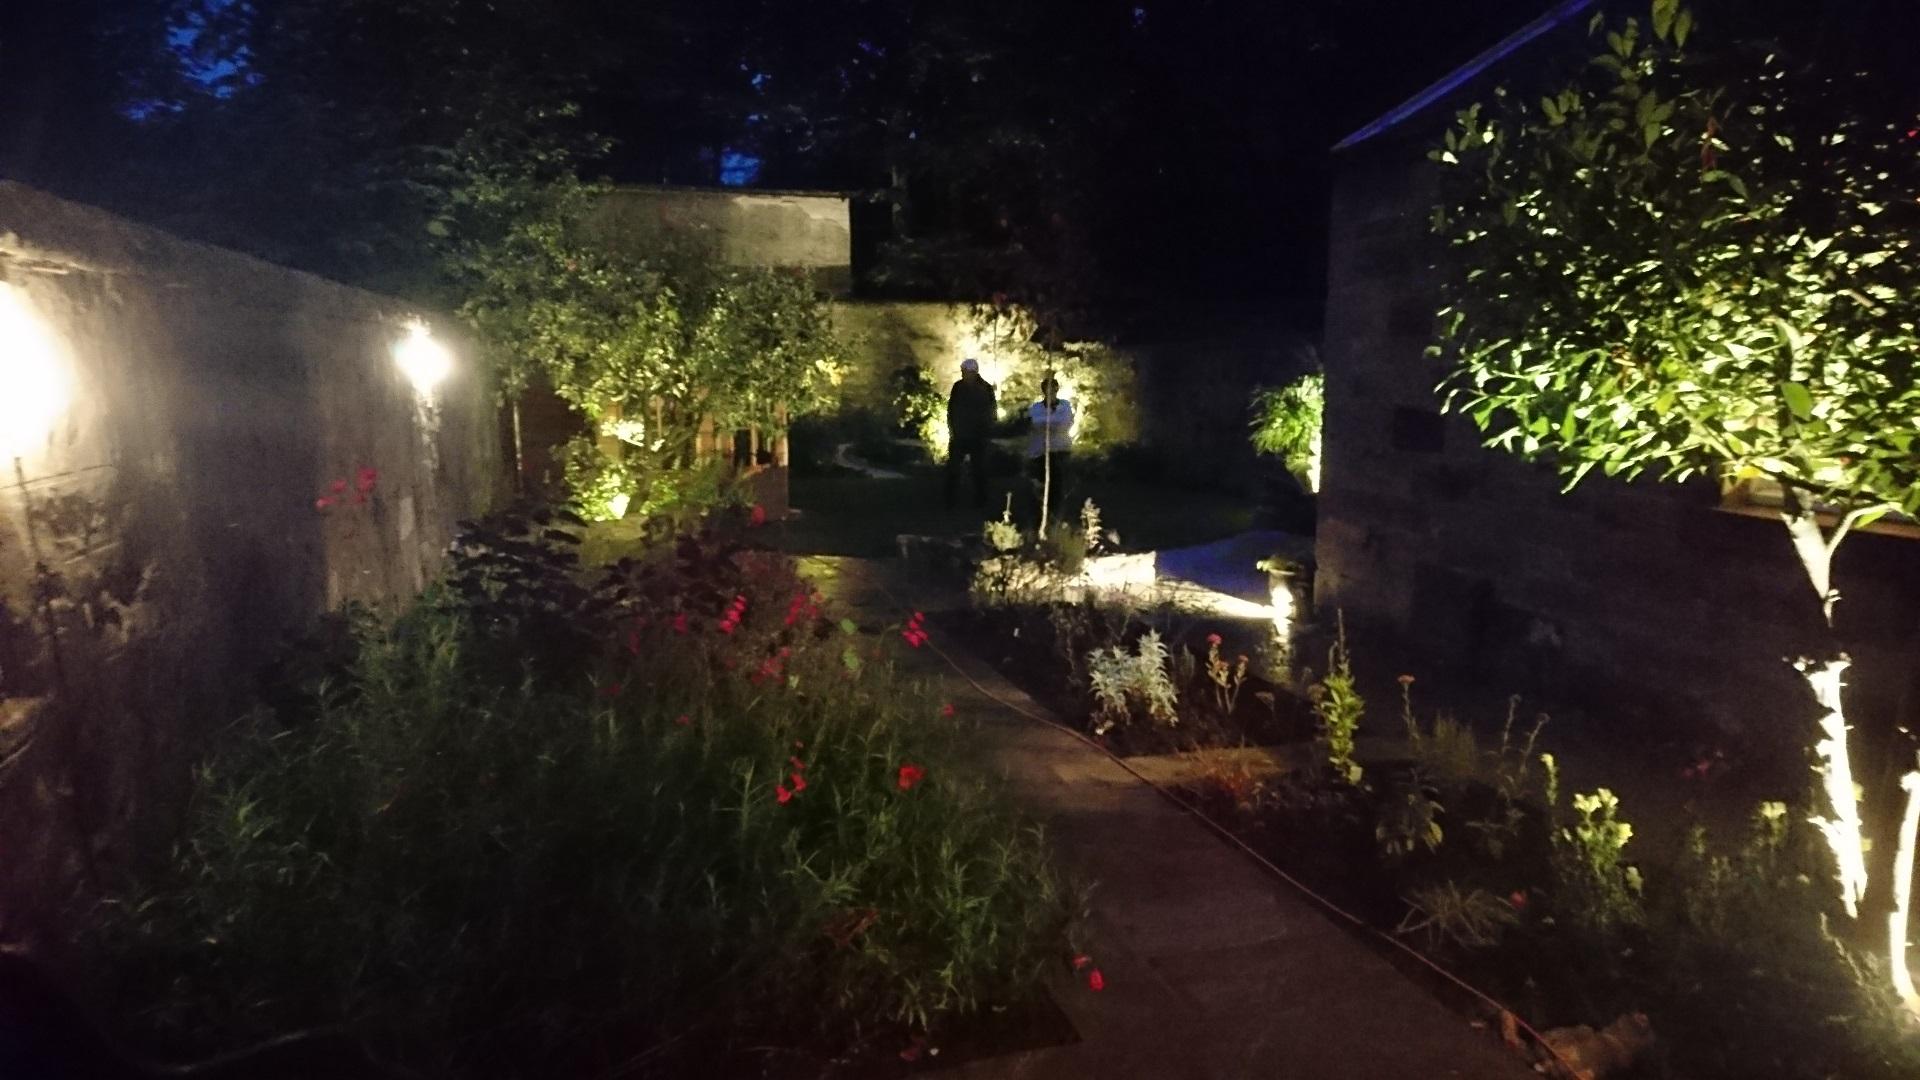 garden entertaining at night Edinburgh